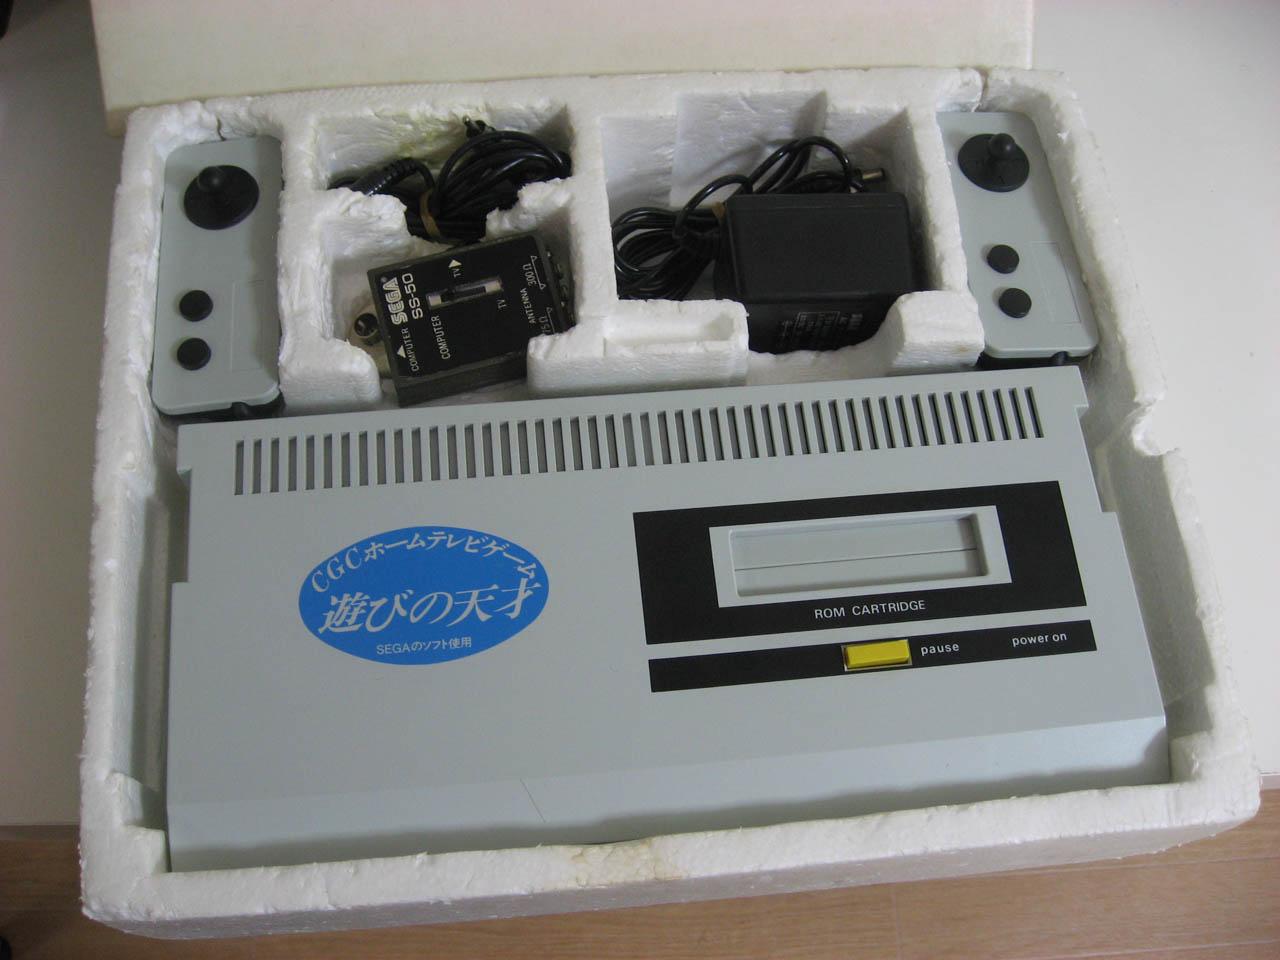 Ma collection Sega 8-bit Sg_1000_ii_asobi_no_tensai_03_759